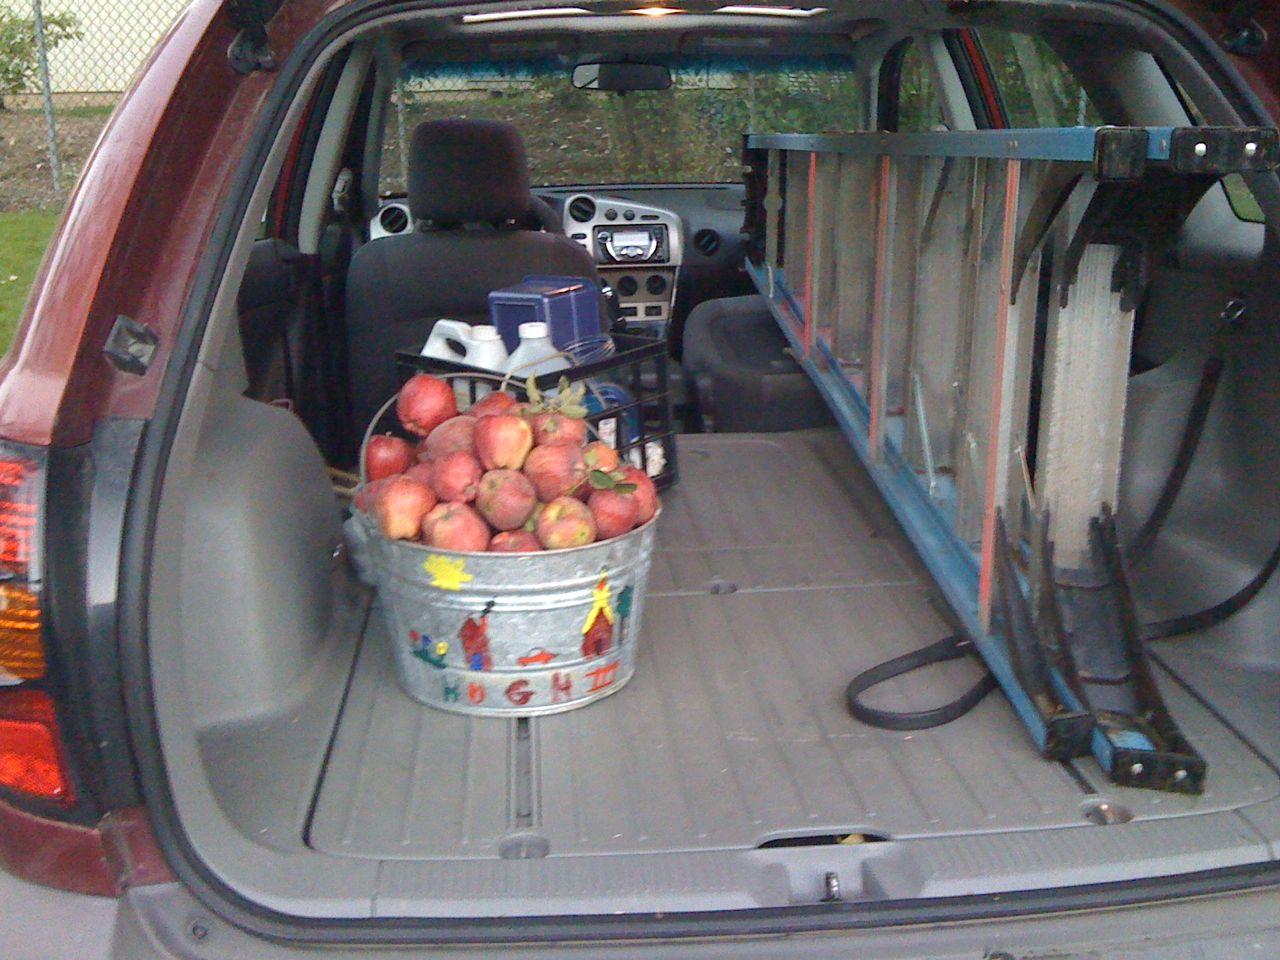 Bucket full of apples from church.